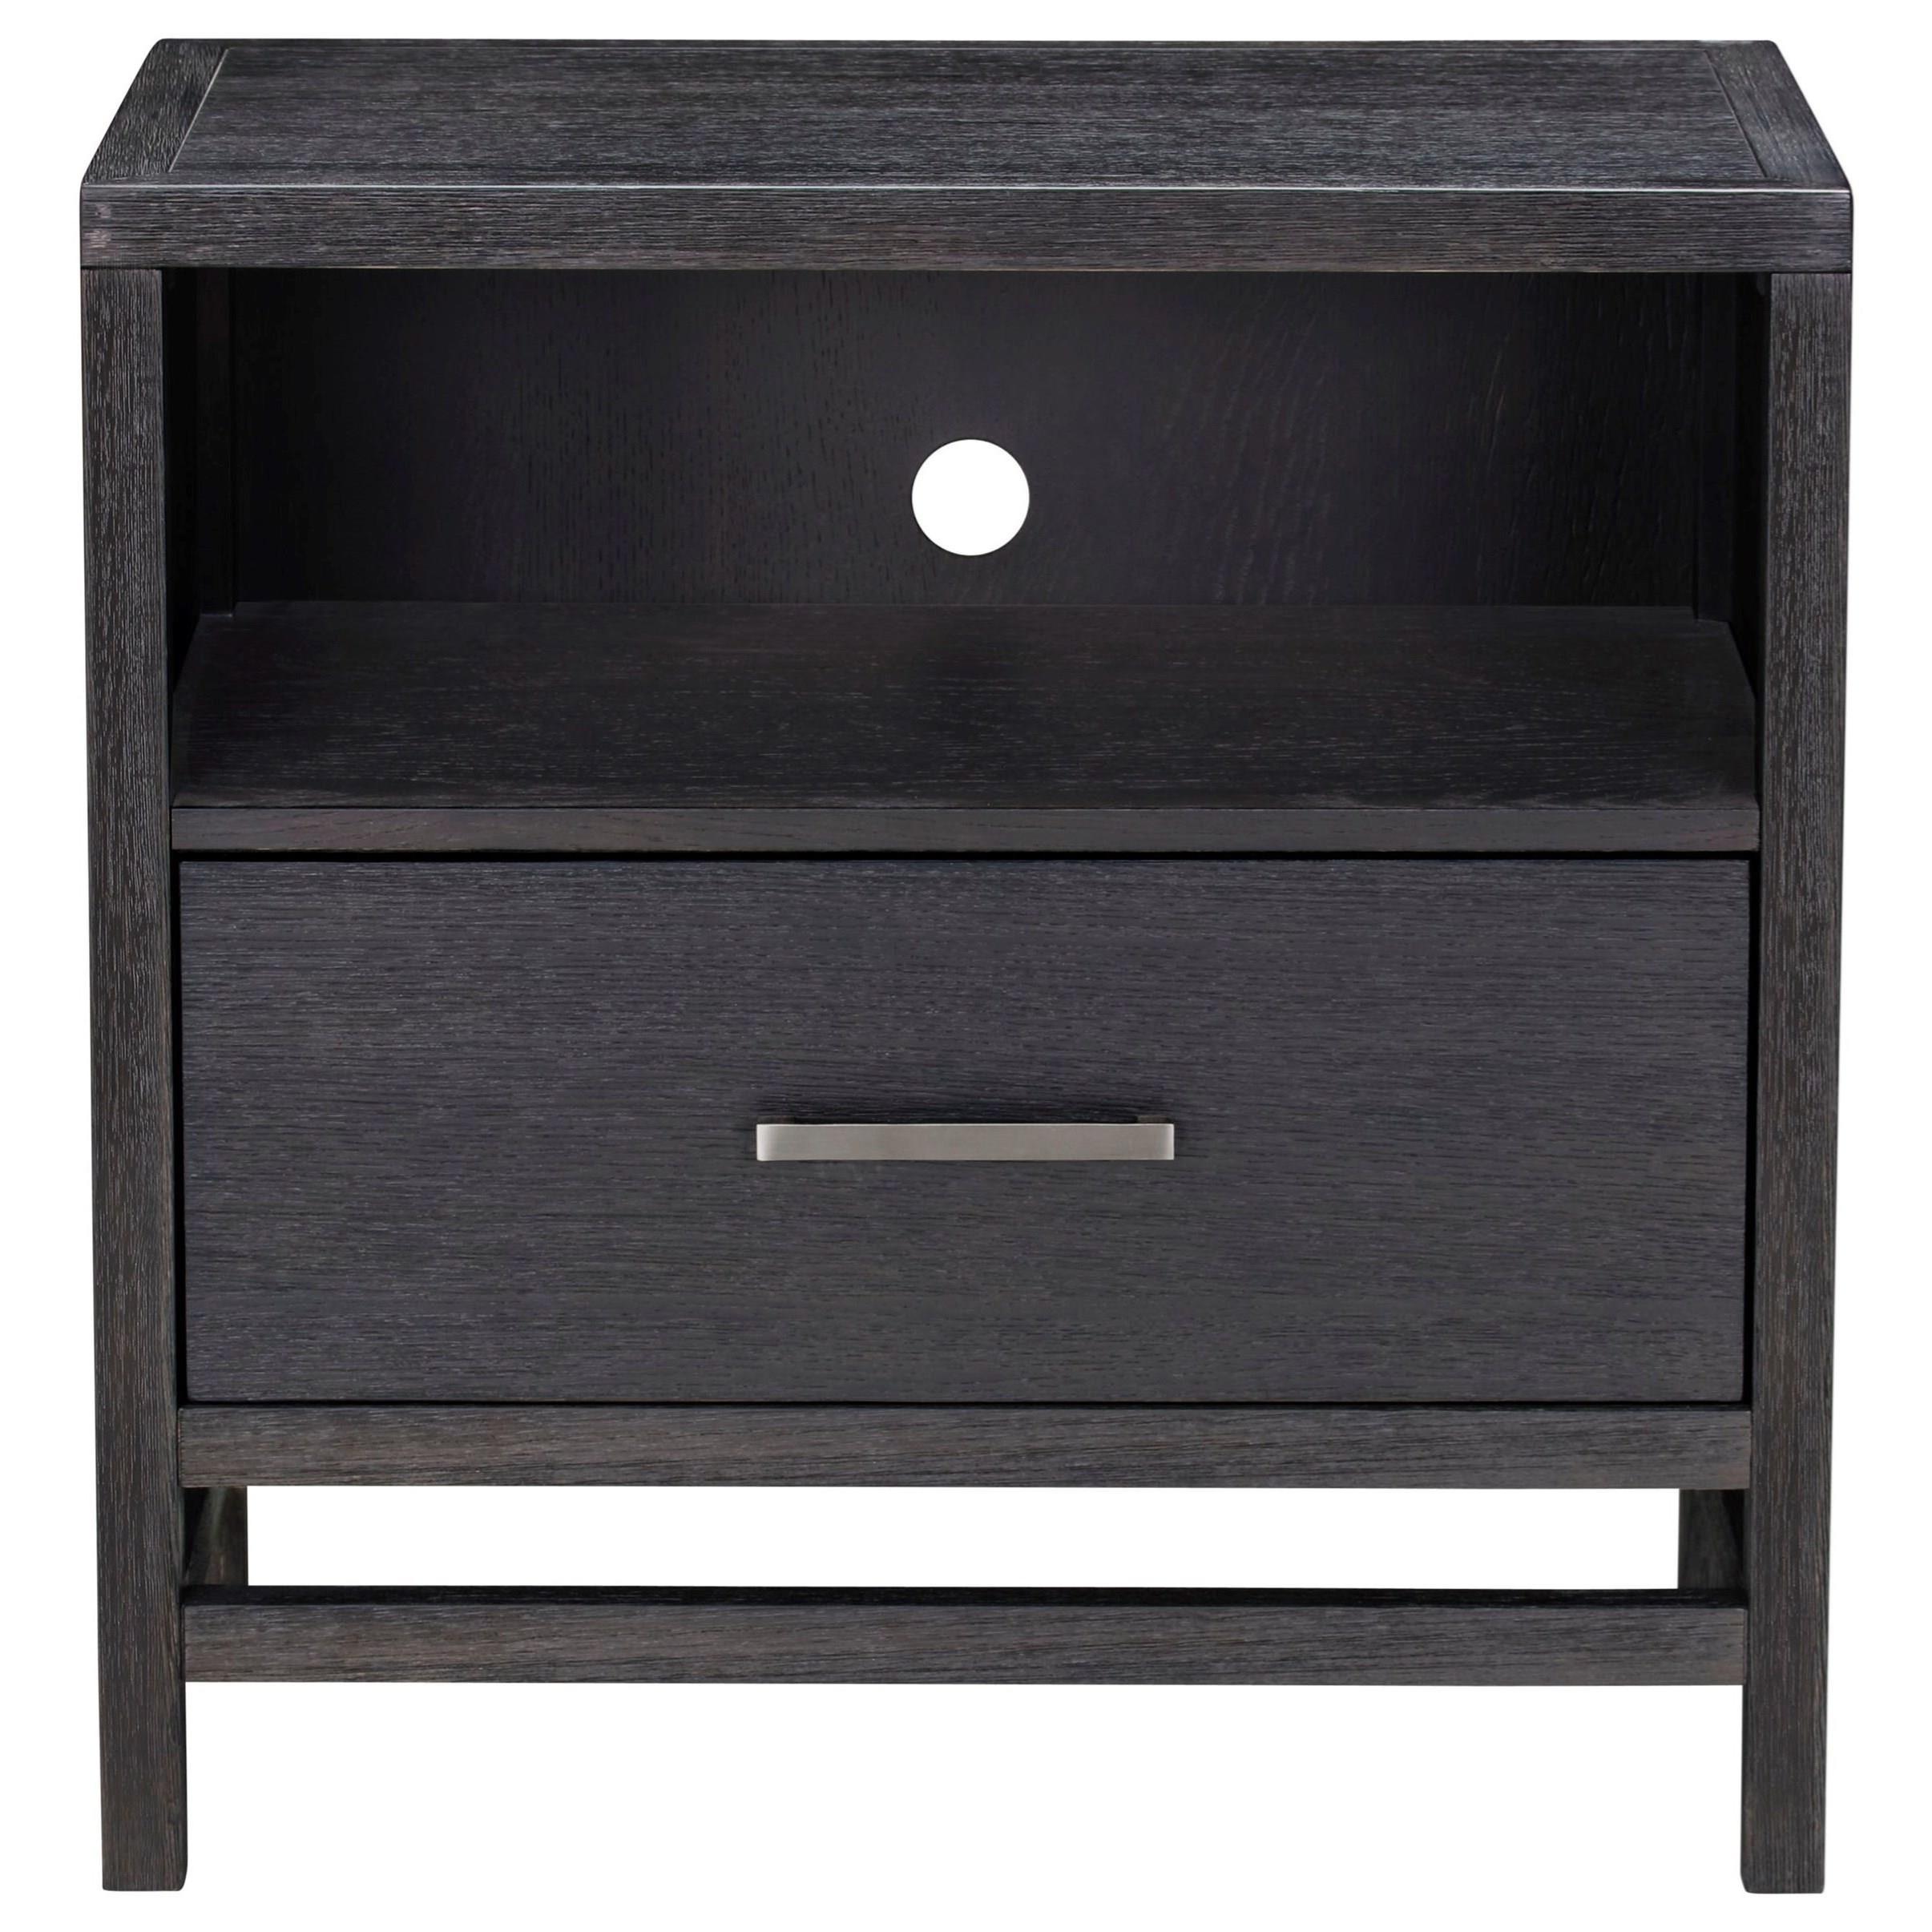 Standard Furniture Thomas Black 86107 Contemporary